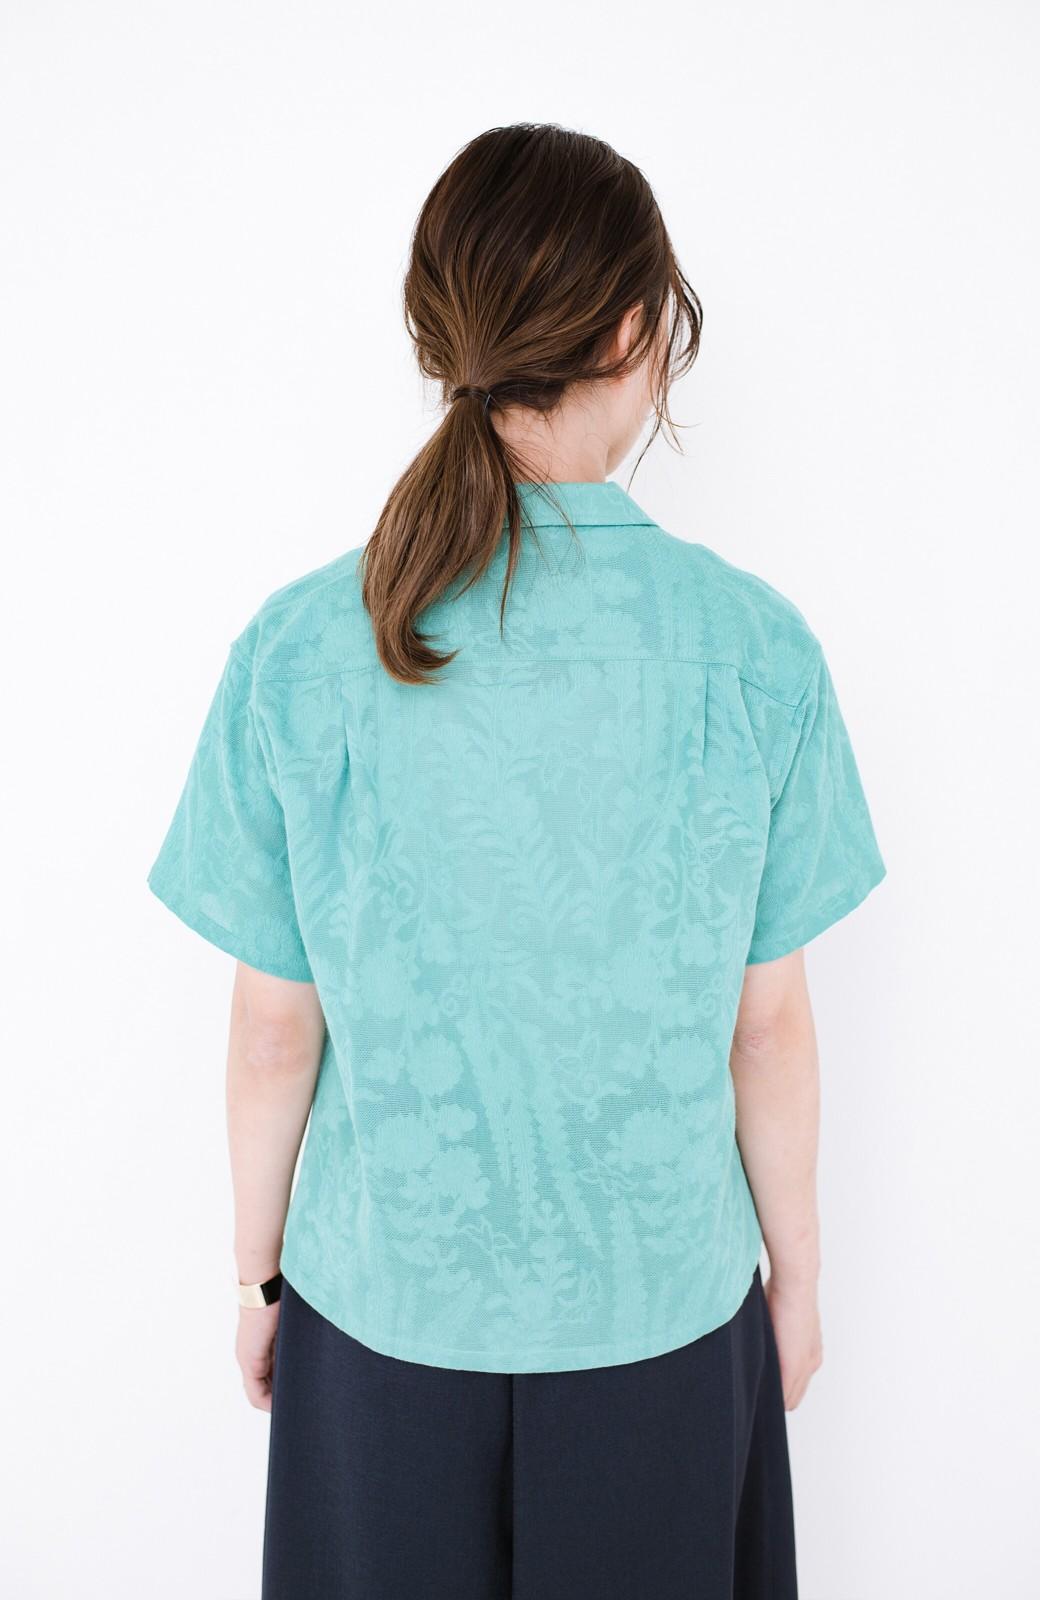 haco! 【今年も再販!】京都の浴衣屋さんと作った浴衣生地のシャツ <グリーン>の商品写真19